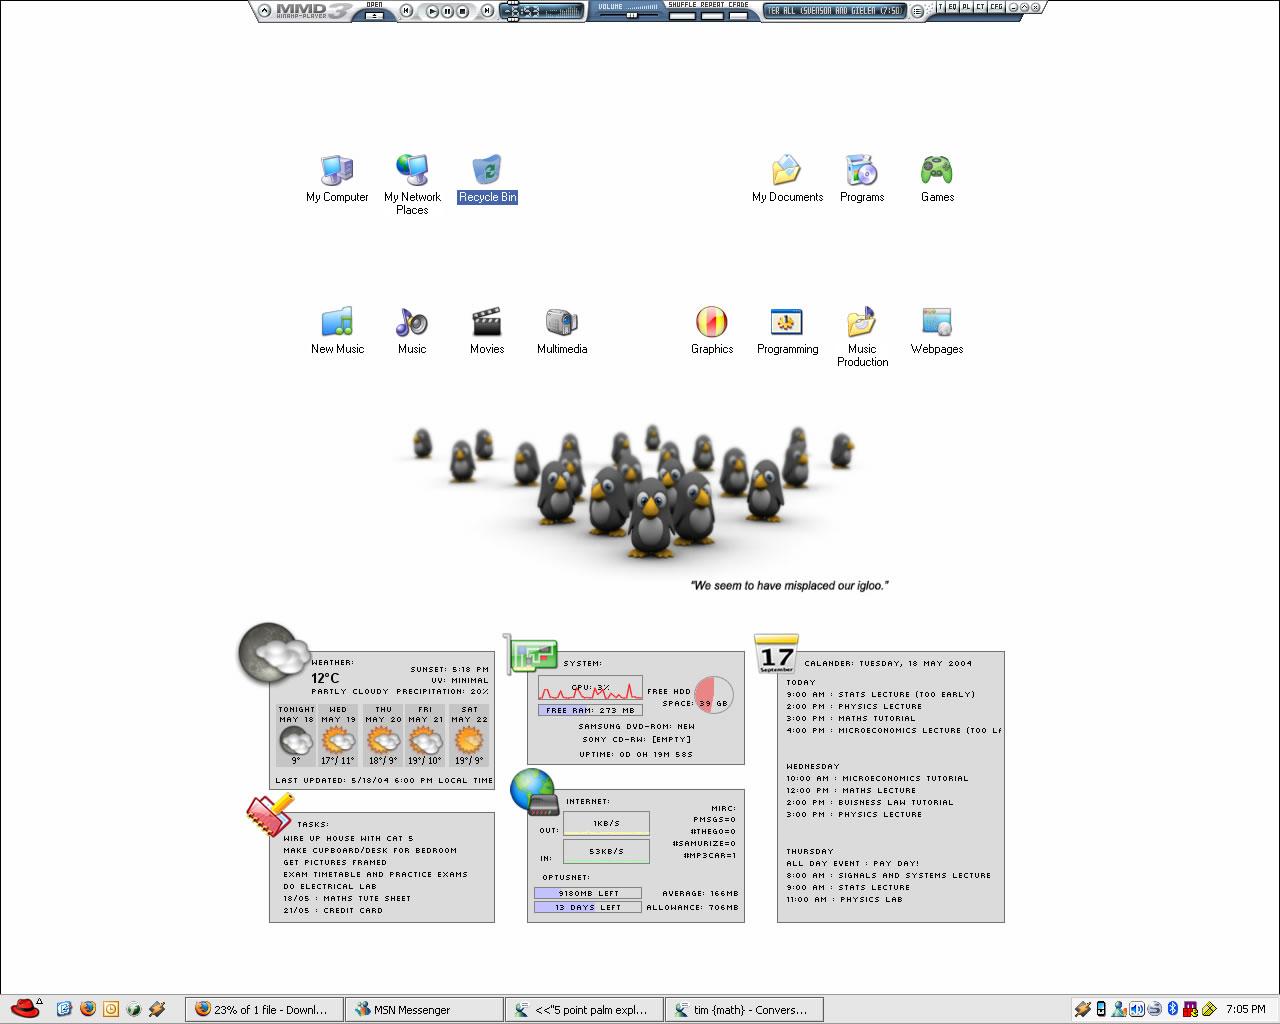 Title: Nic's desktop